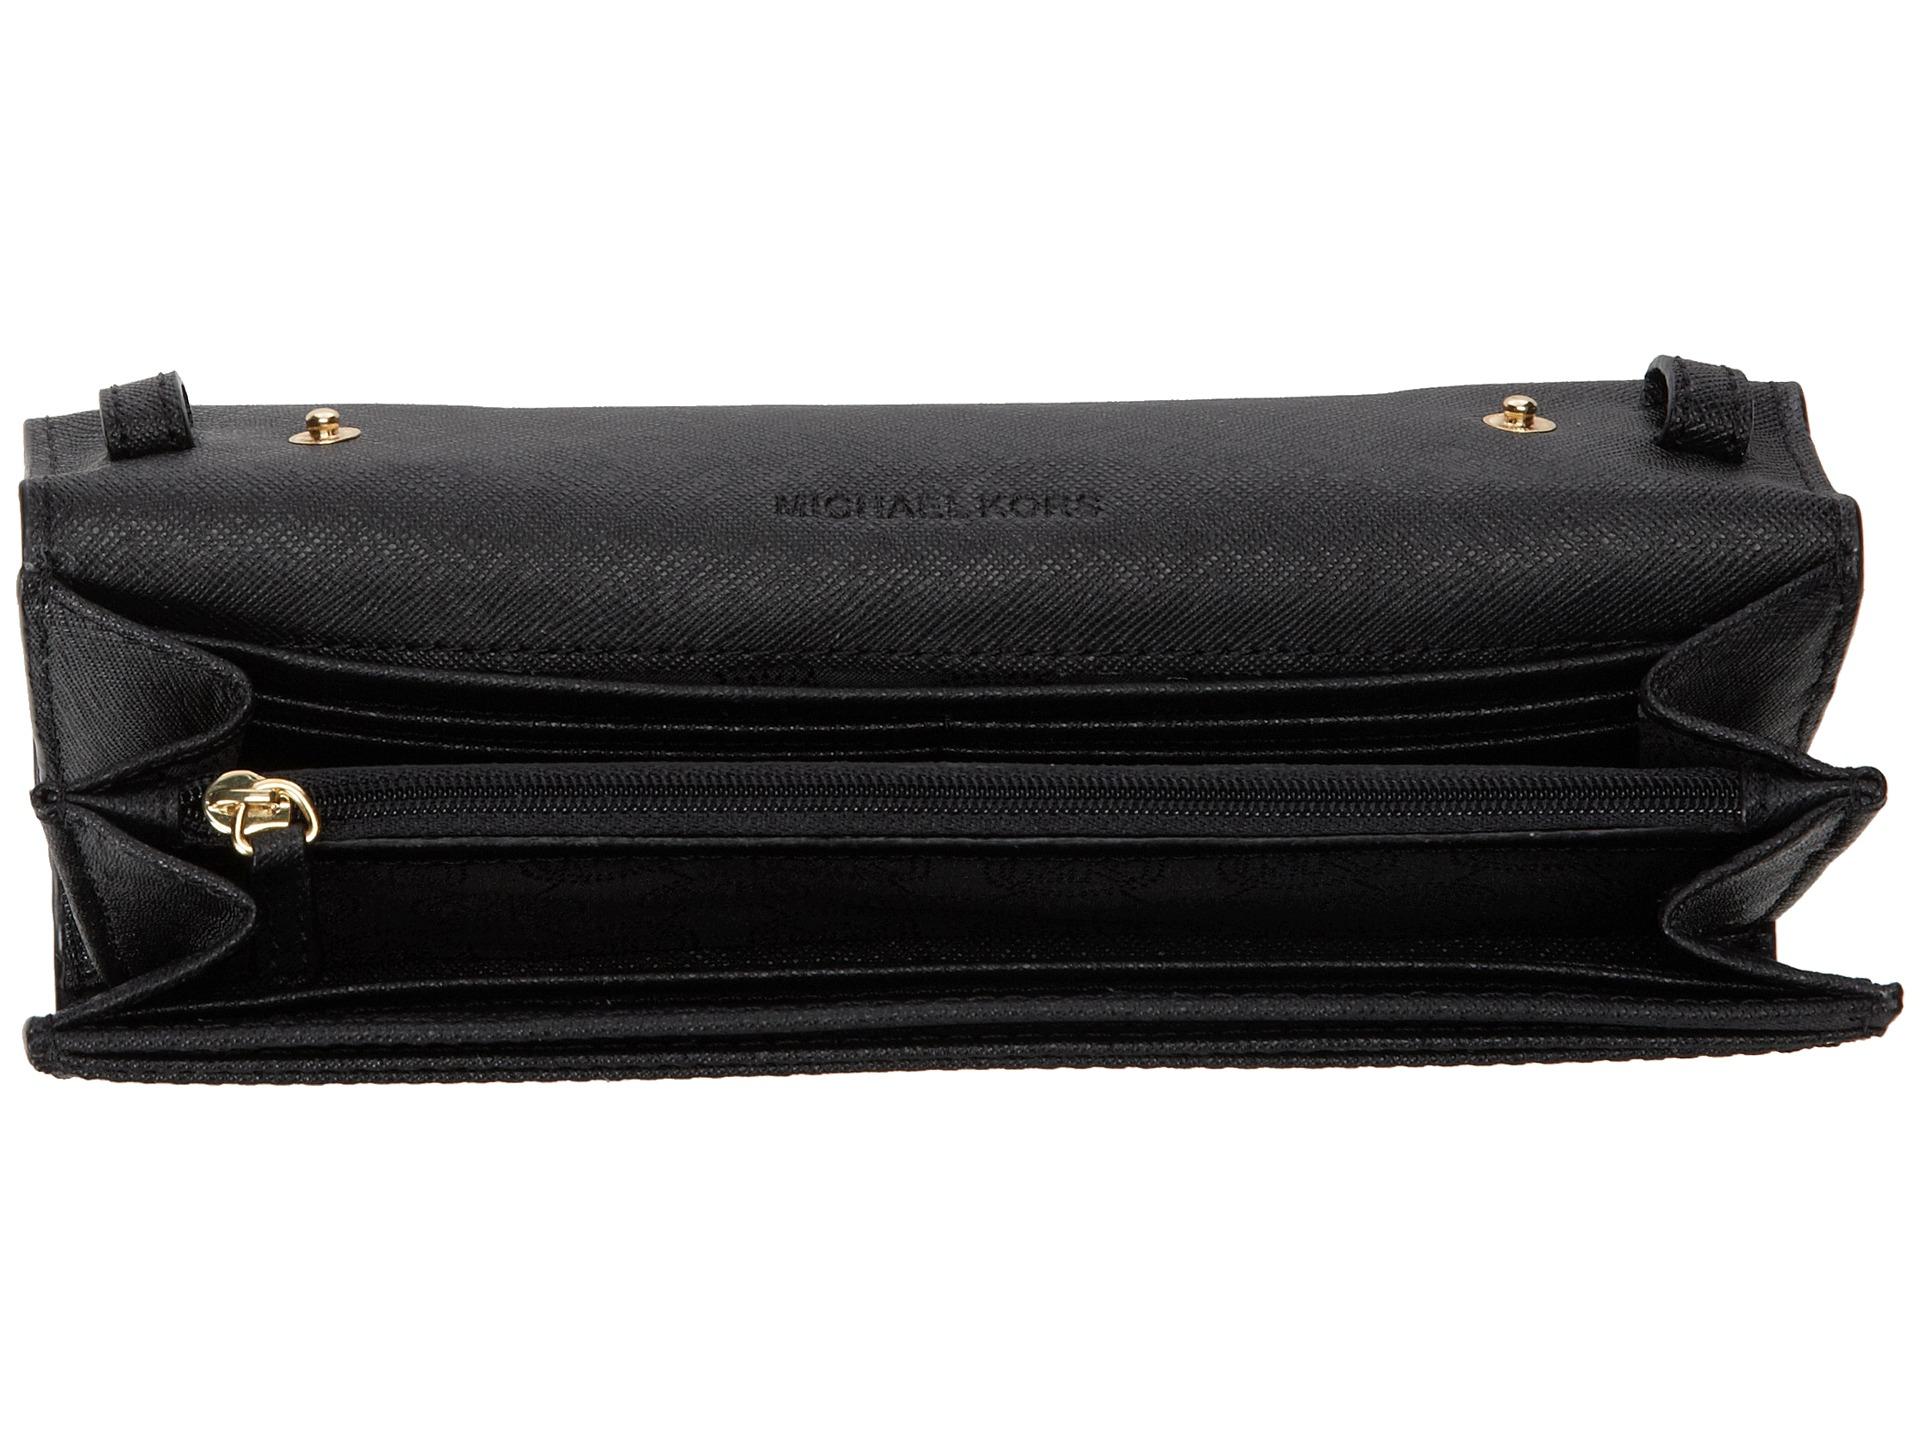 c0f9a50098cd Michael Kors Jet Set Travel Wallet On A Chain Black - Best Photo ...